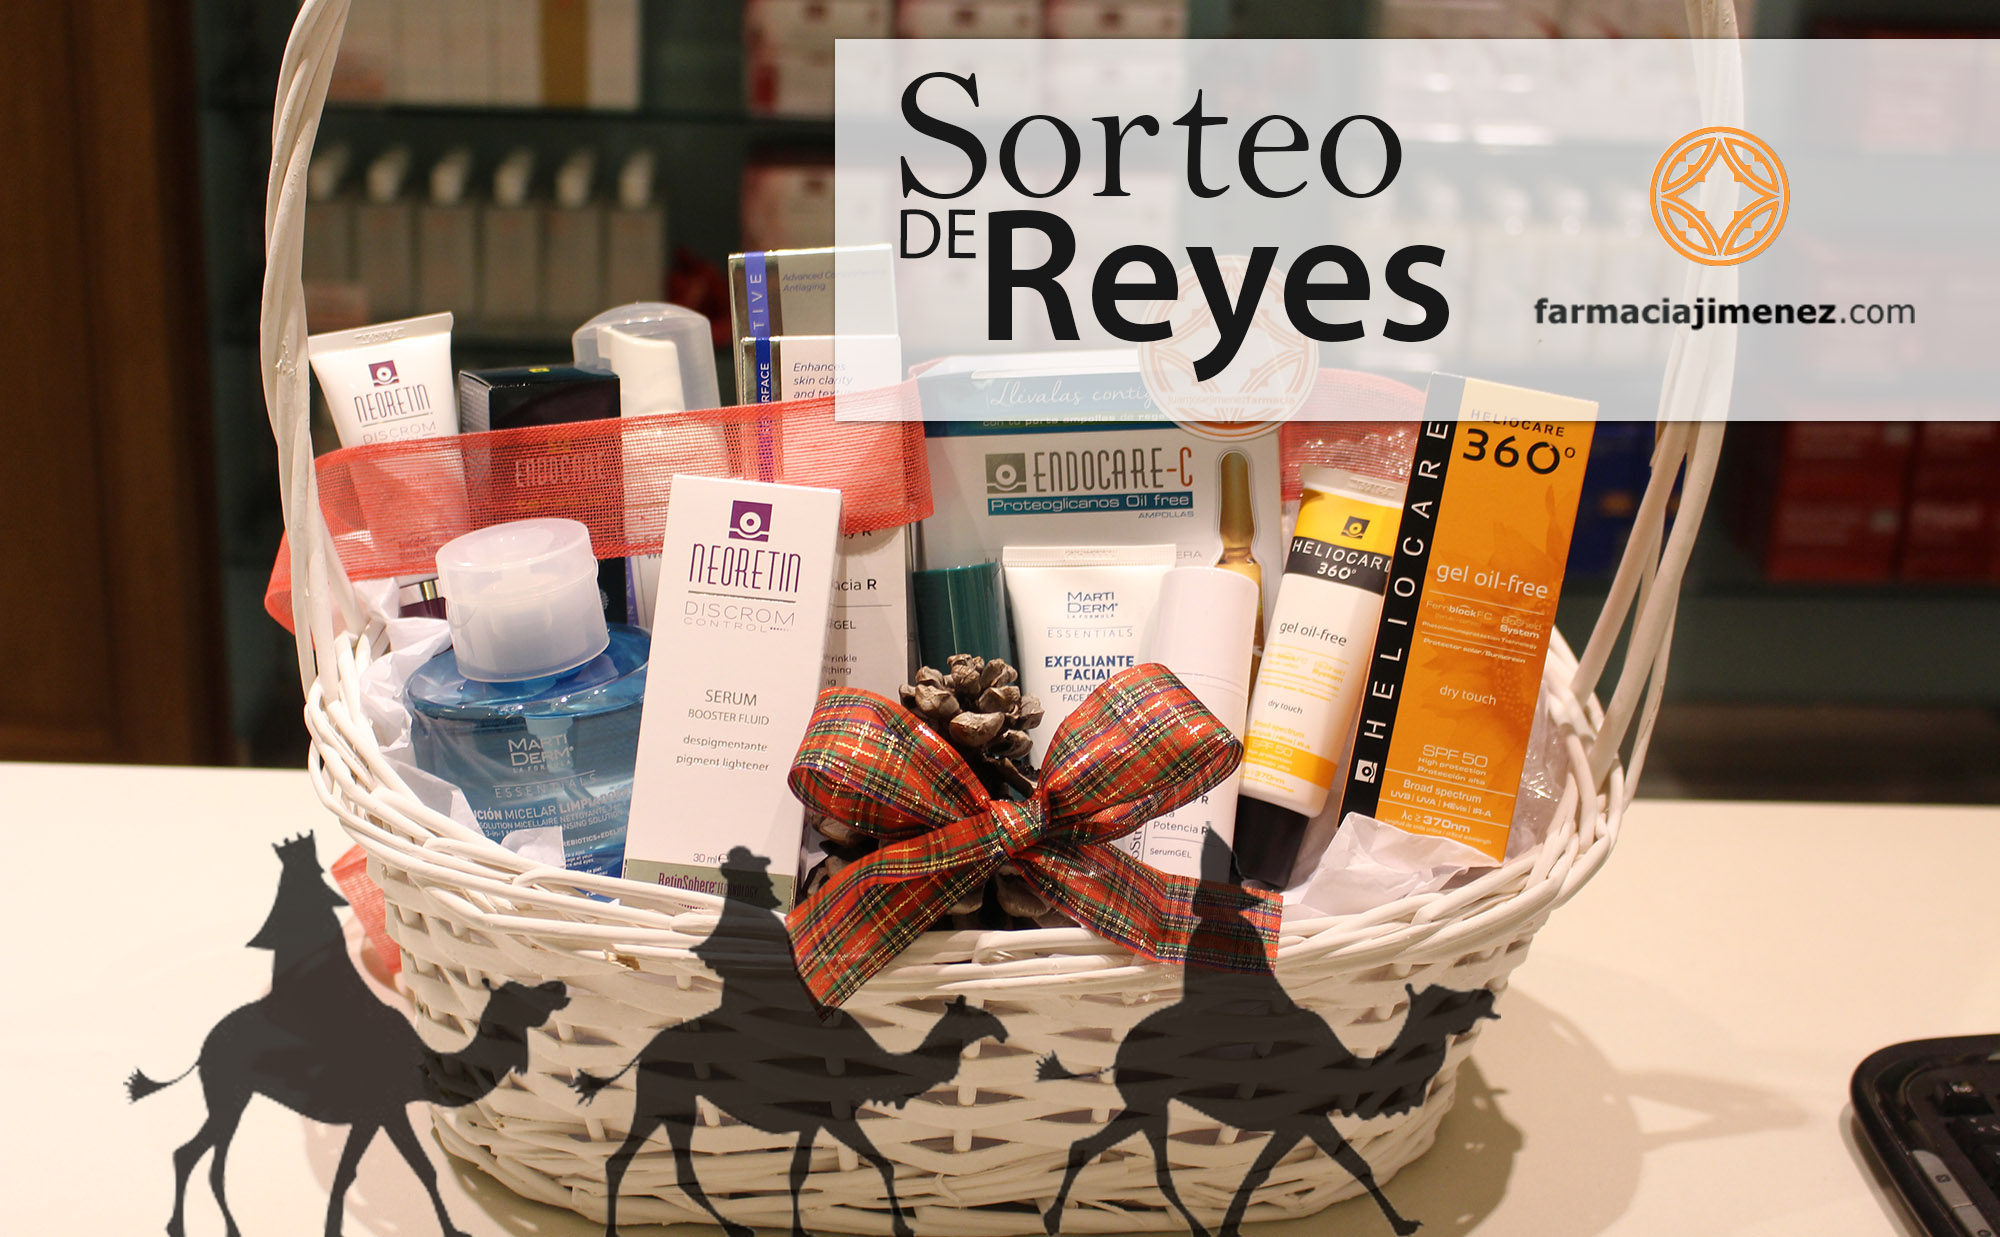 Farmacia Jiménez | Sorteo de Reyes: 2 Rutinas de Belleza personalizadas